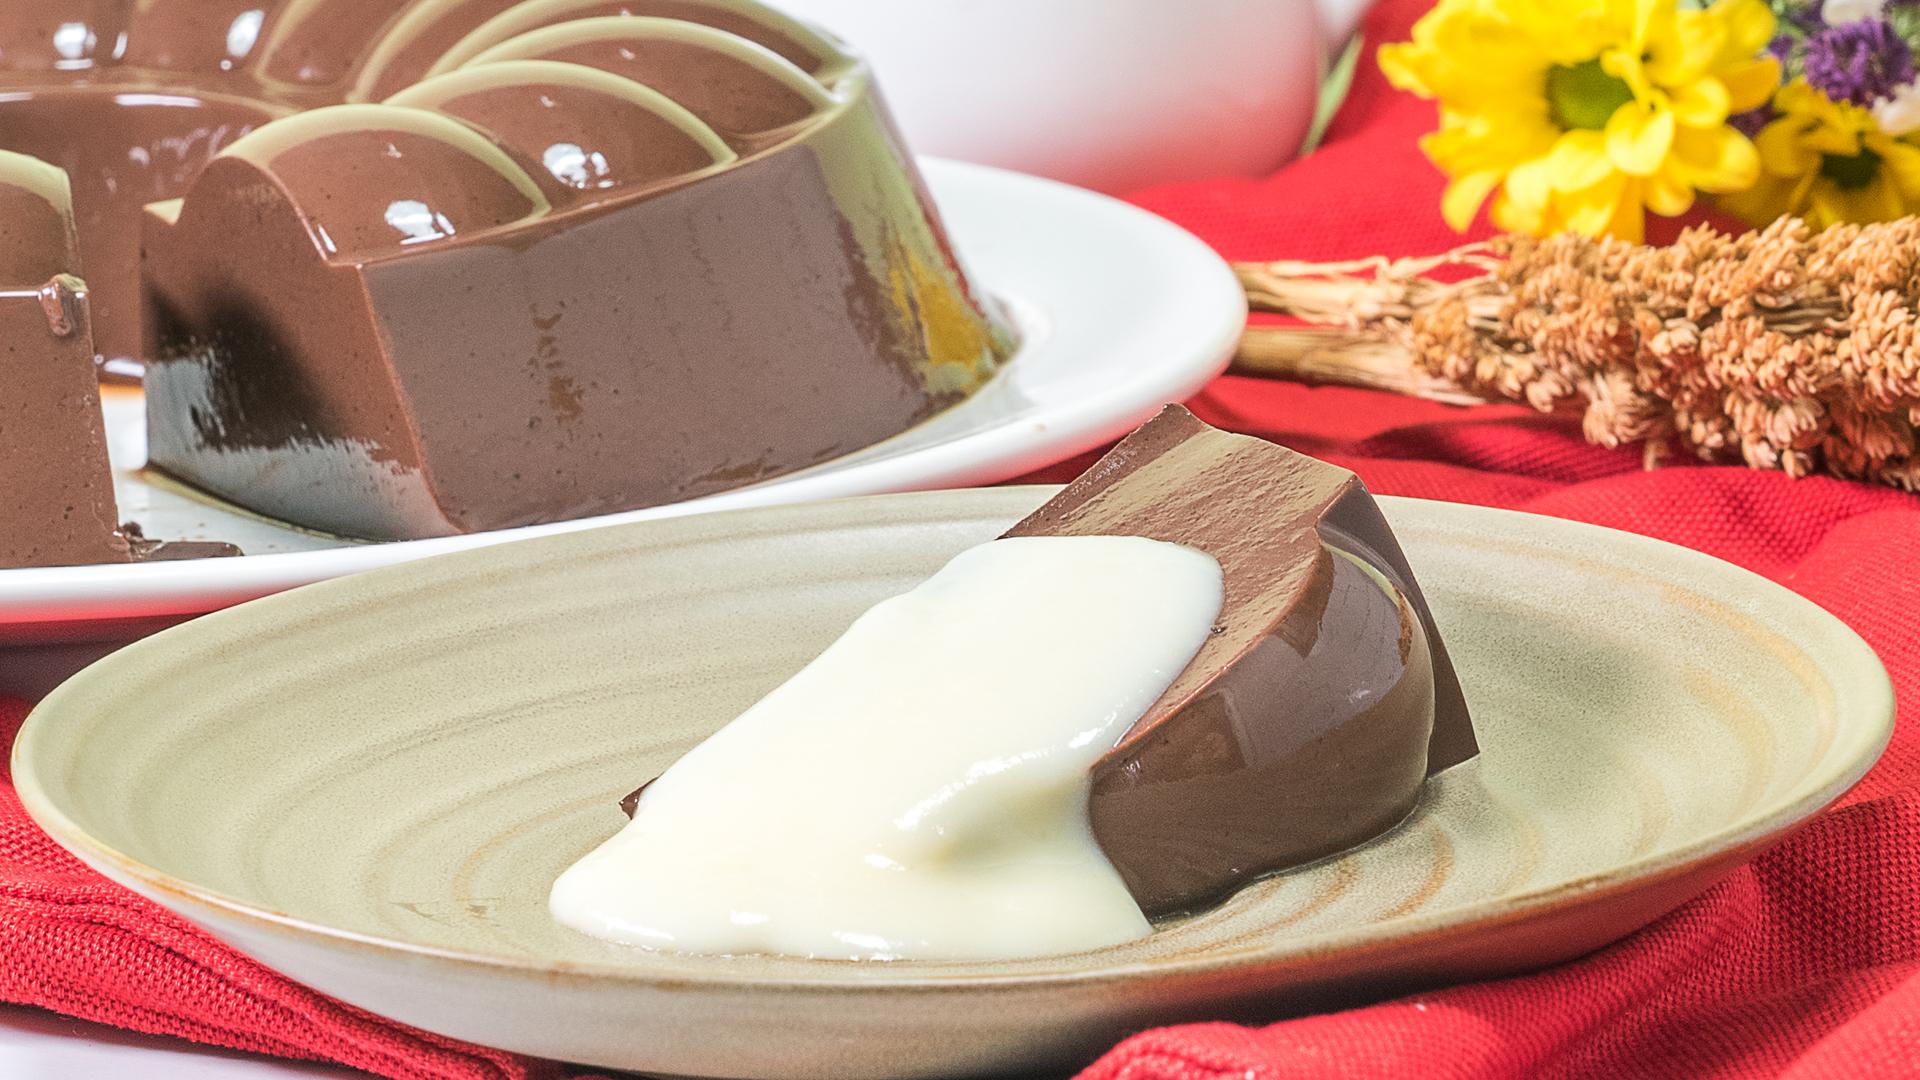 Resep Puding Susu Karamel Dalam Botol - Recipes Blog b